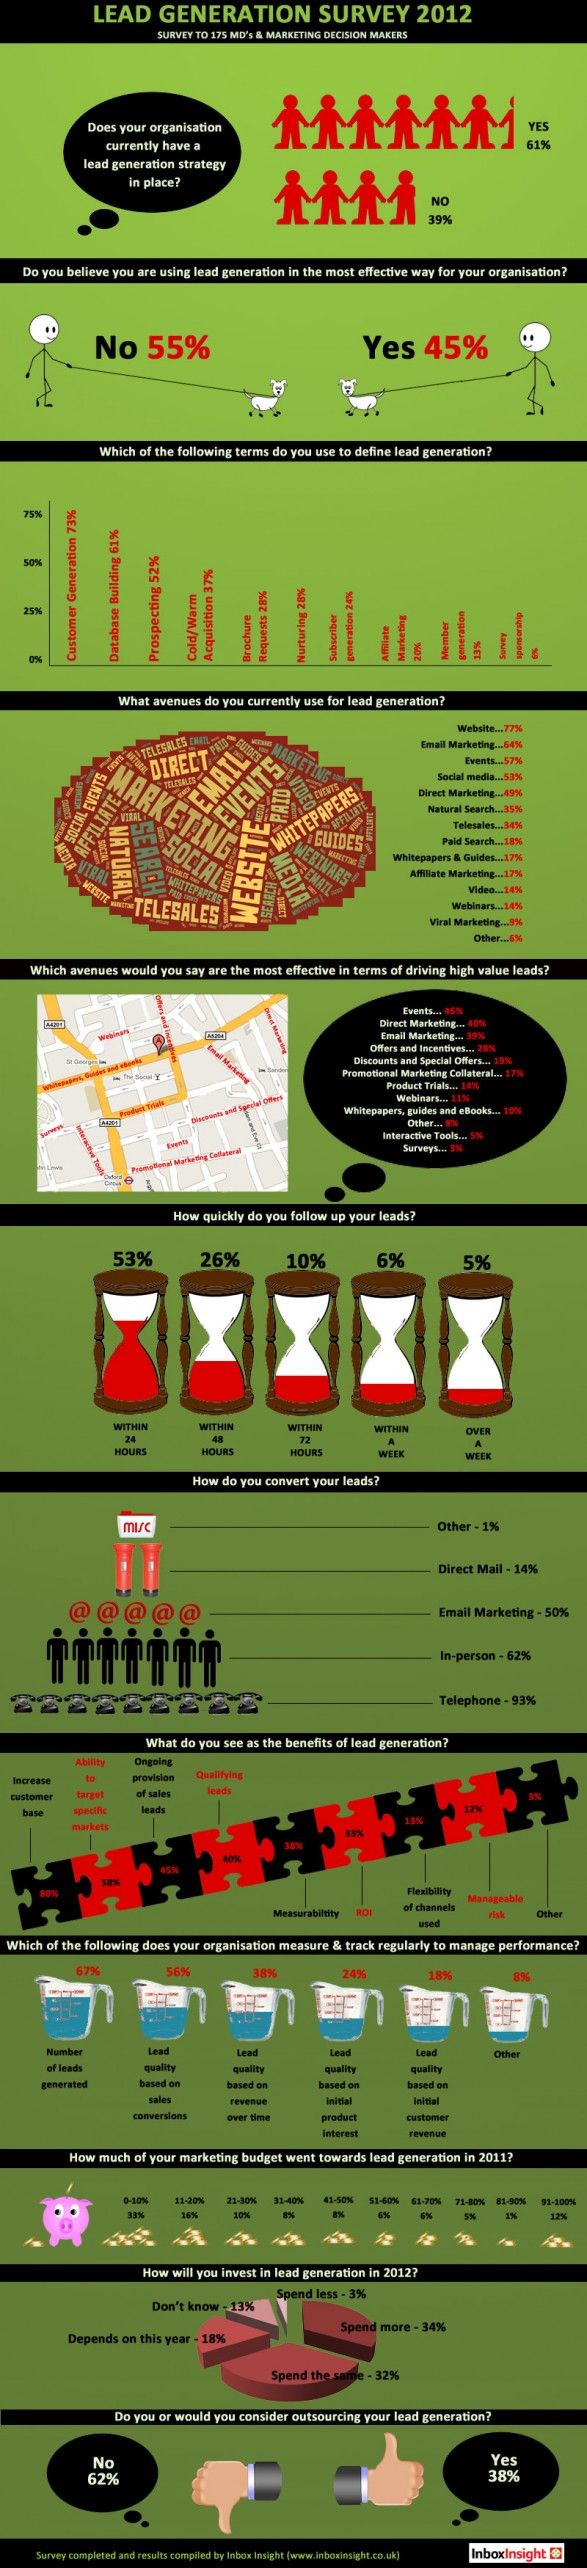 Lead Generation Survey - Infog